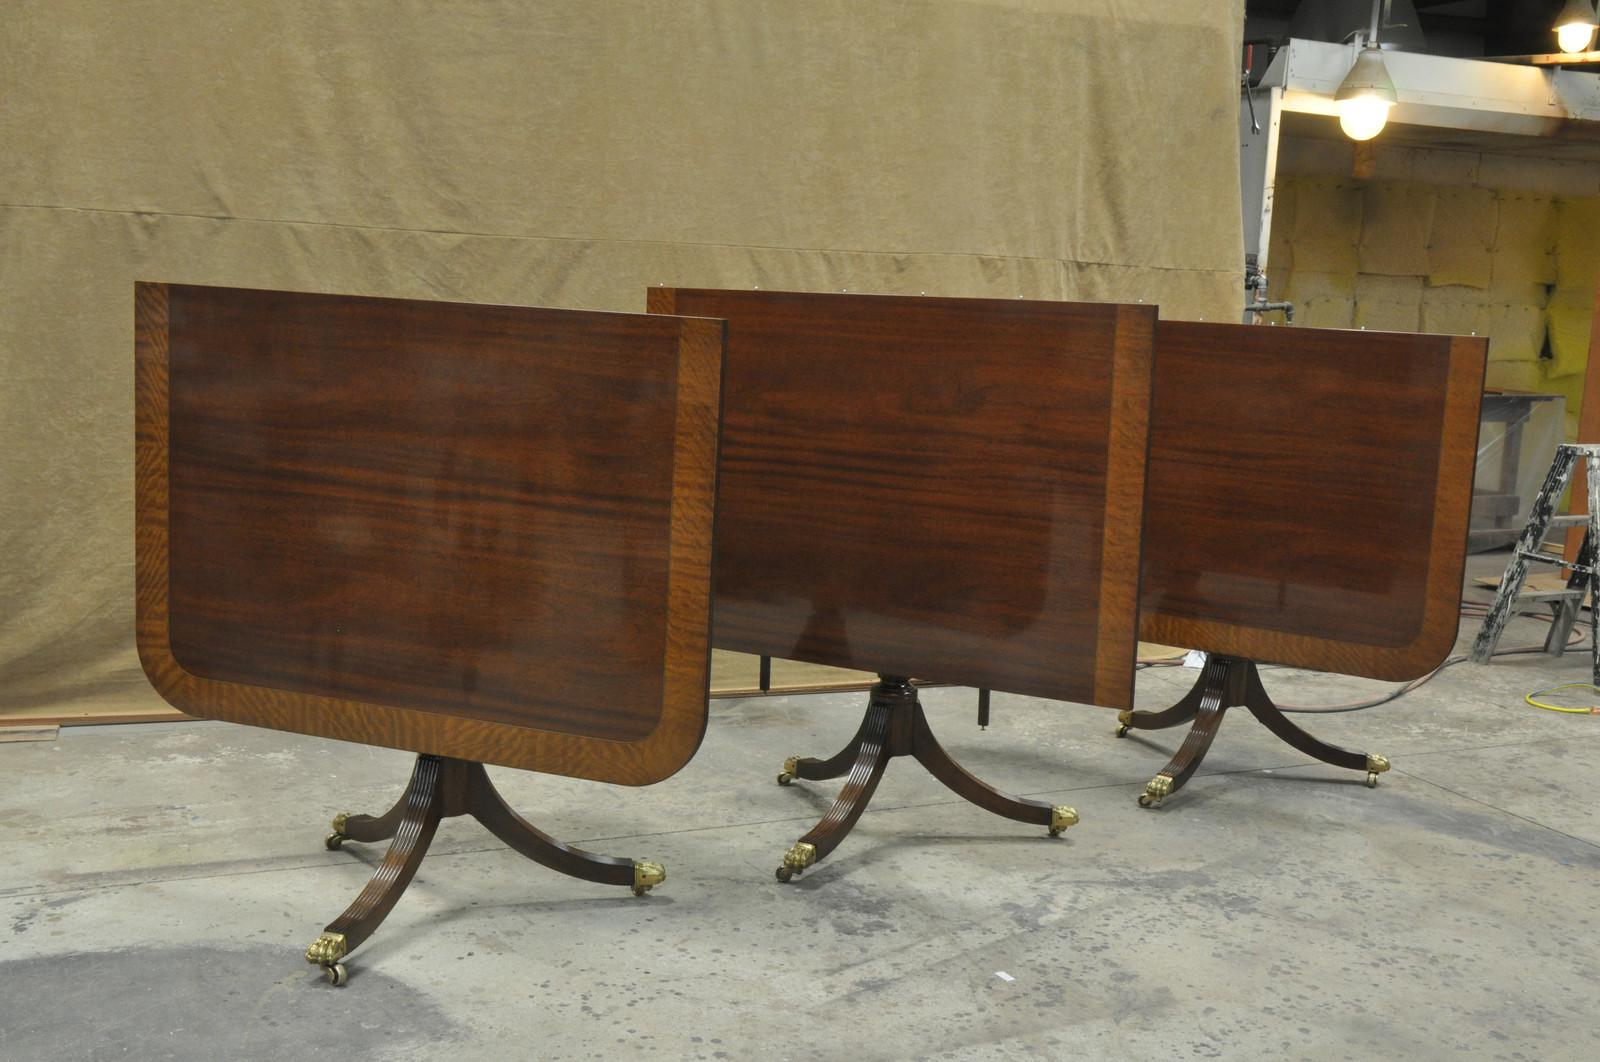 Shop Floor Kittinger Furniture Company